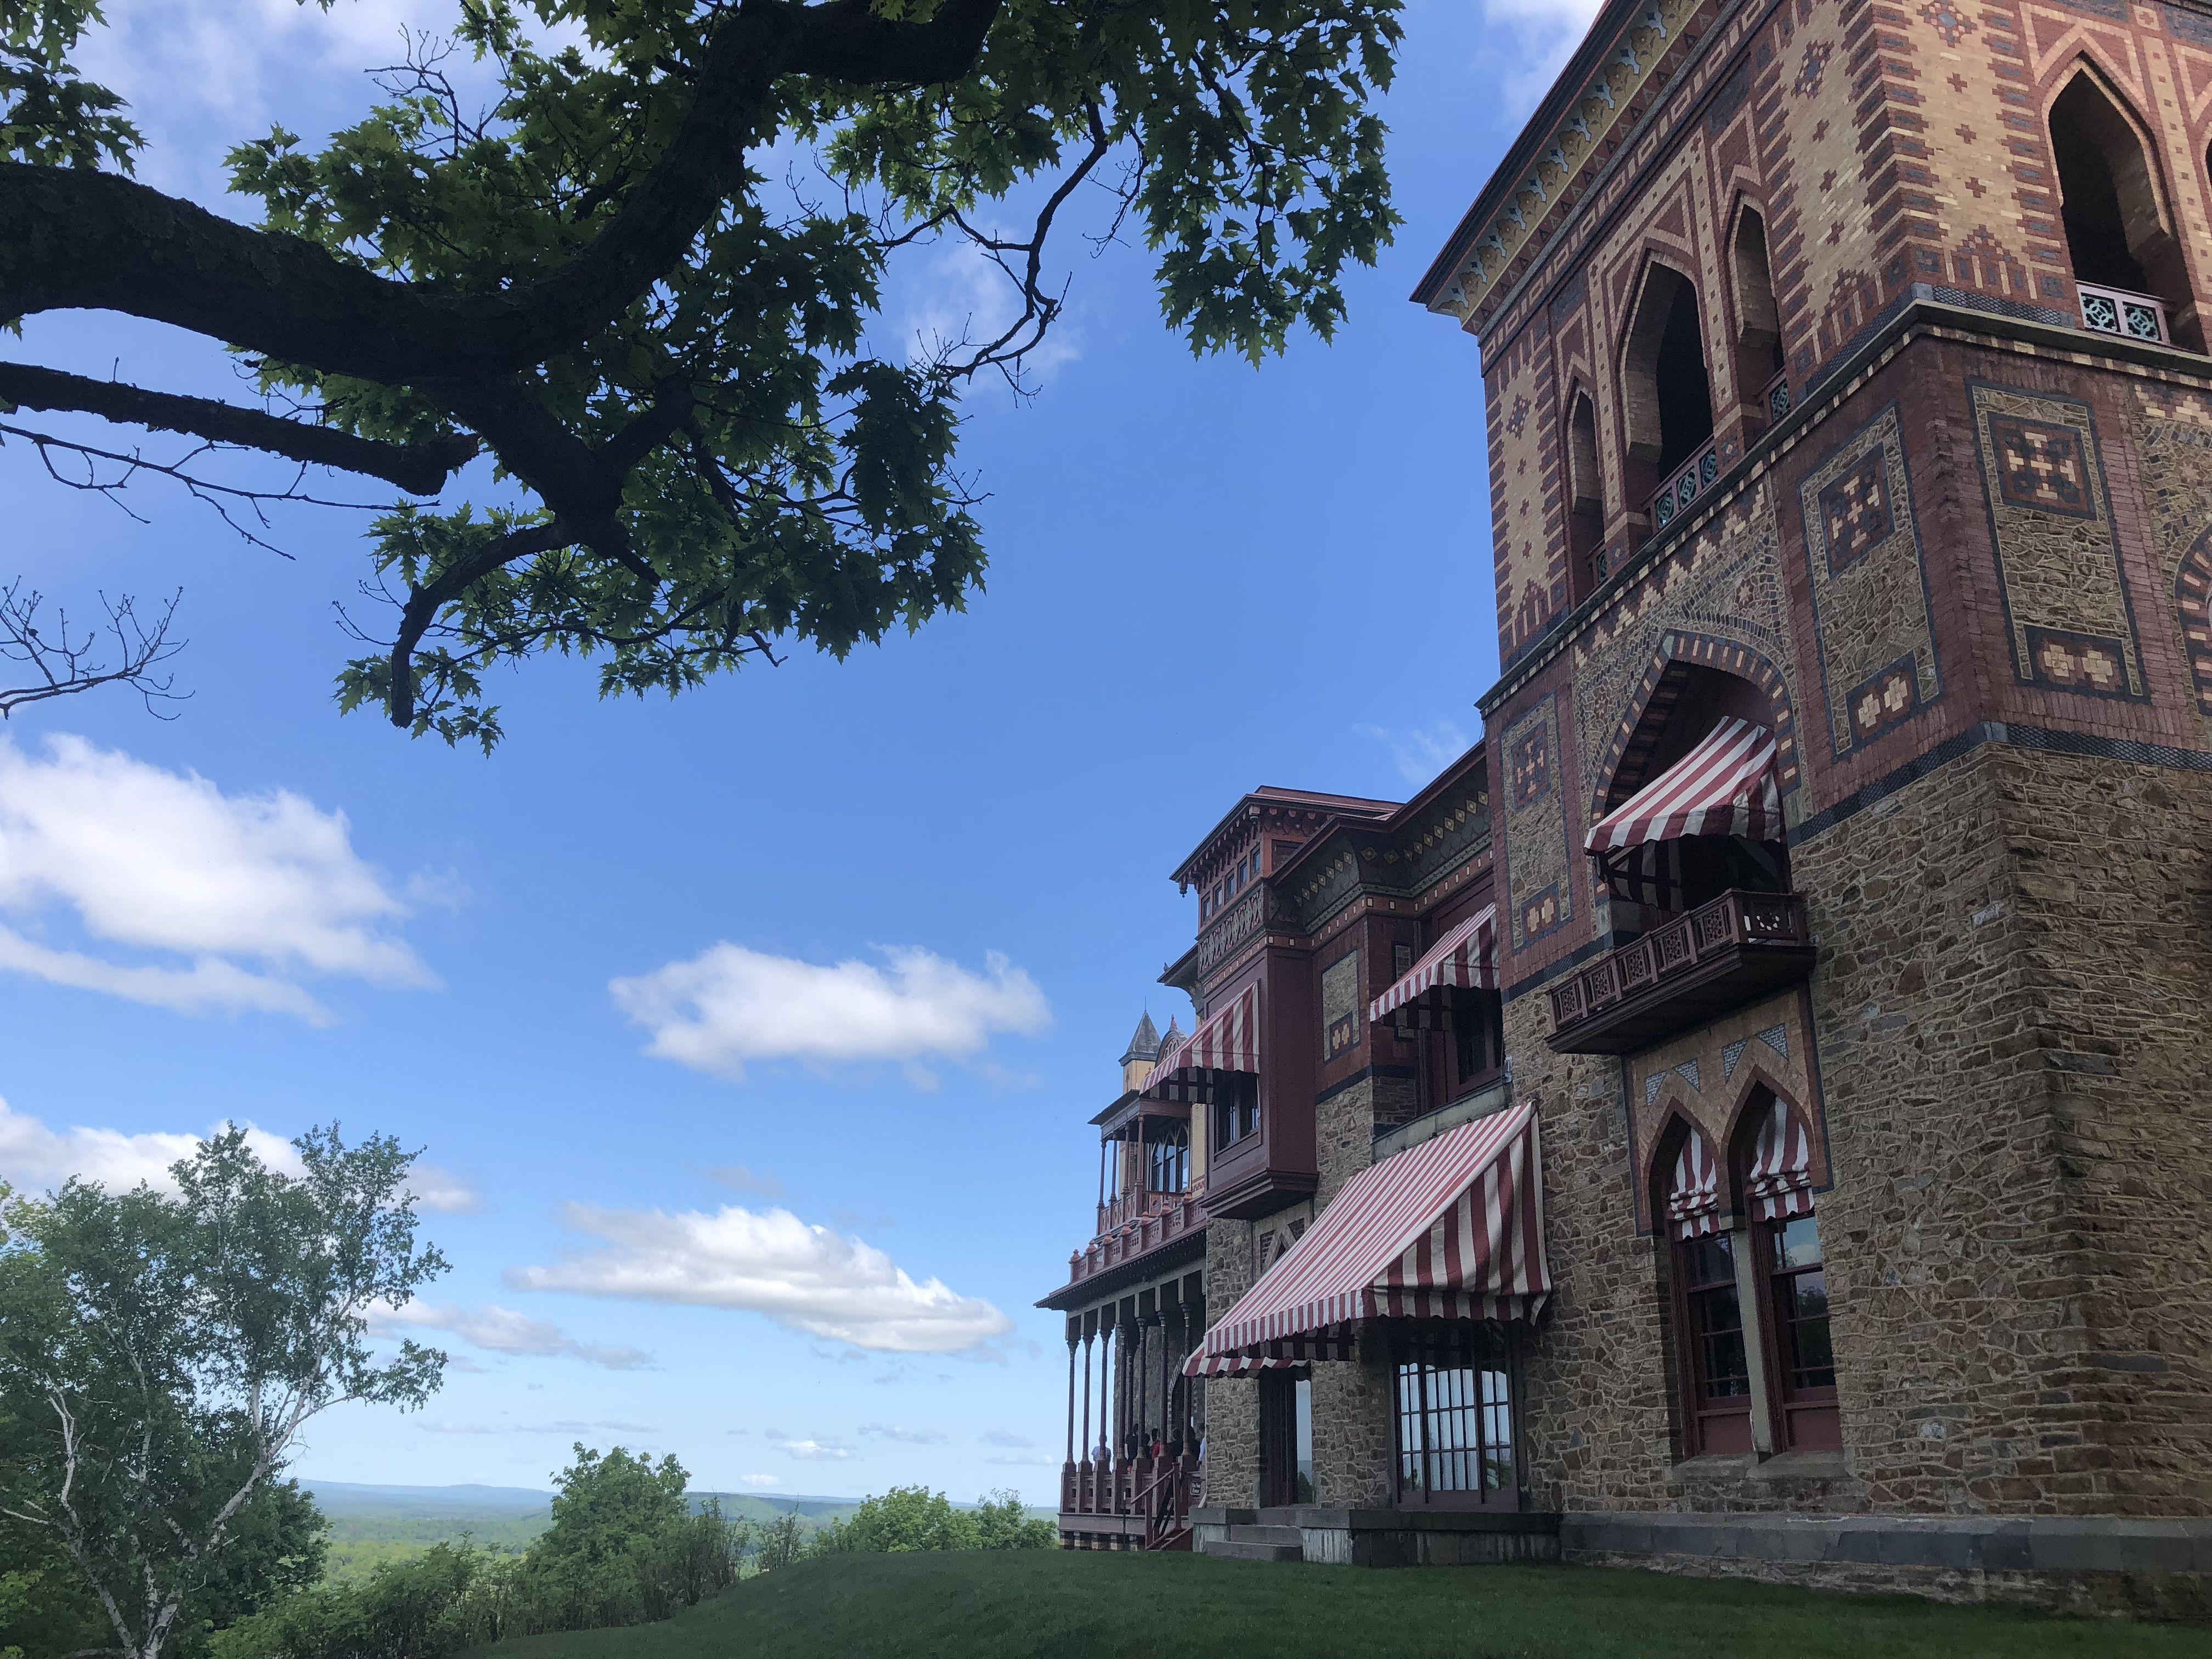 Olana: The Top 8 Things to Do in Hudson, NY